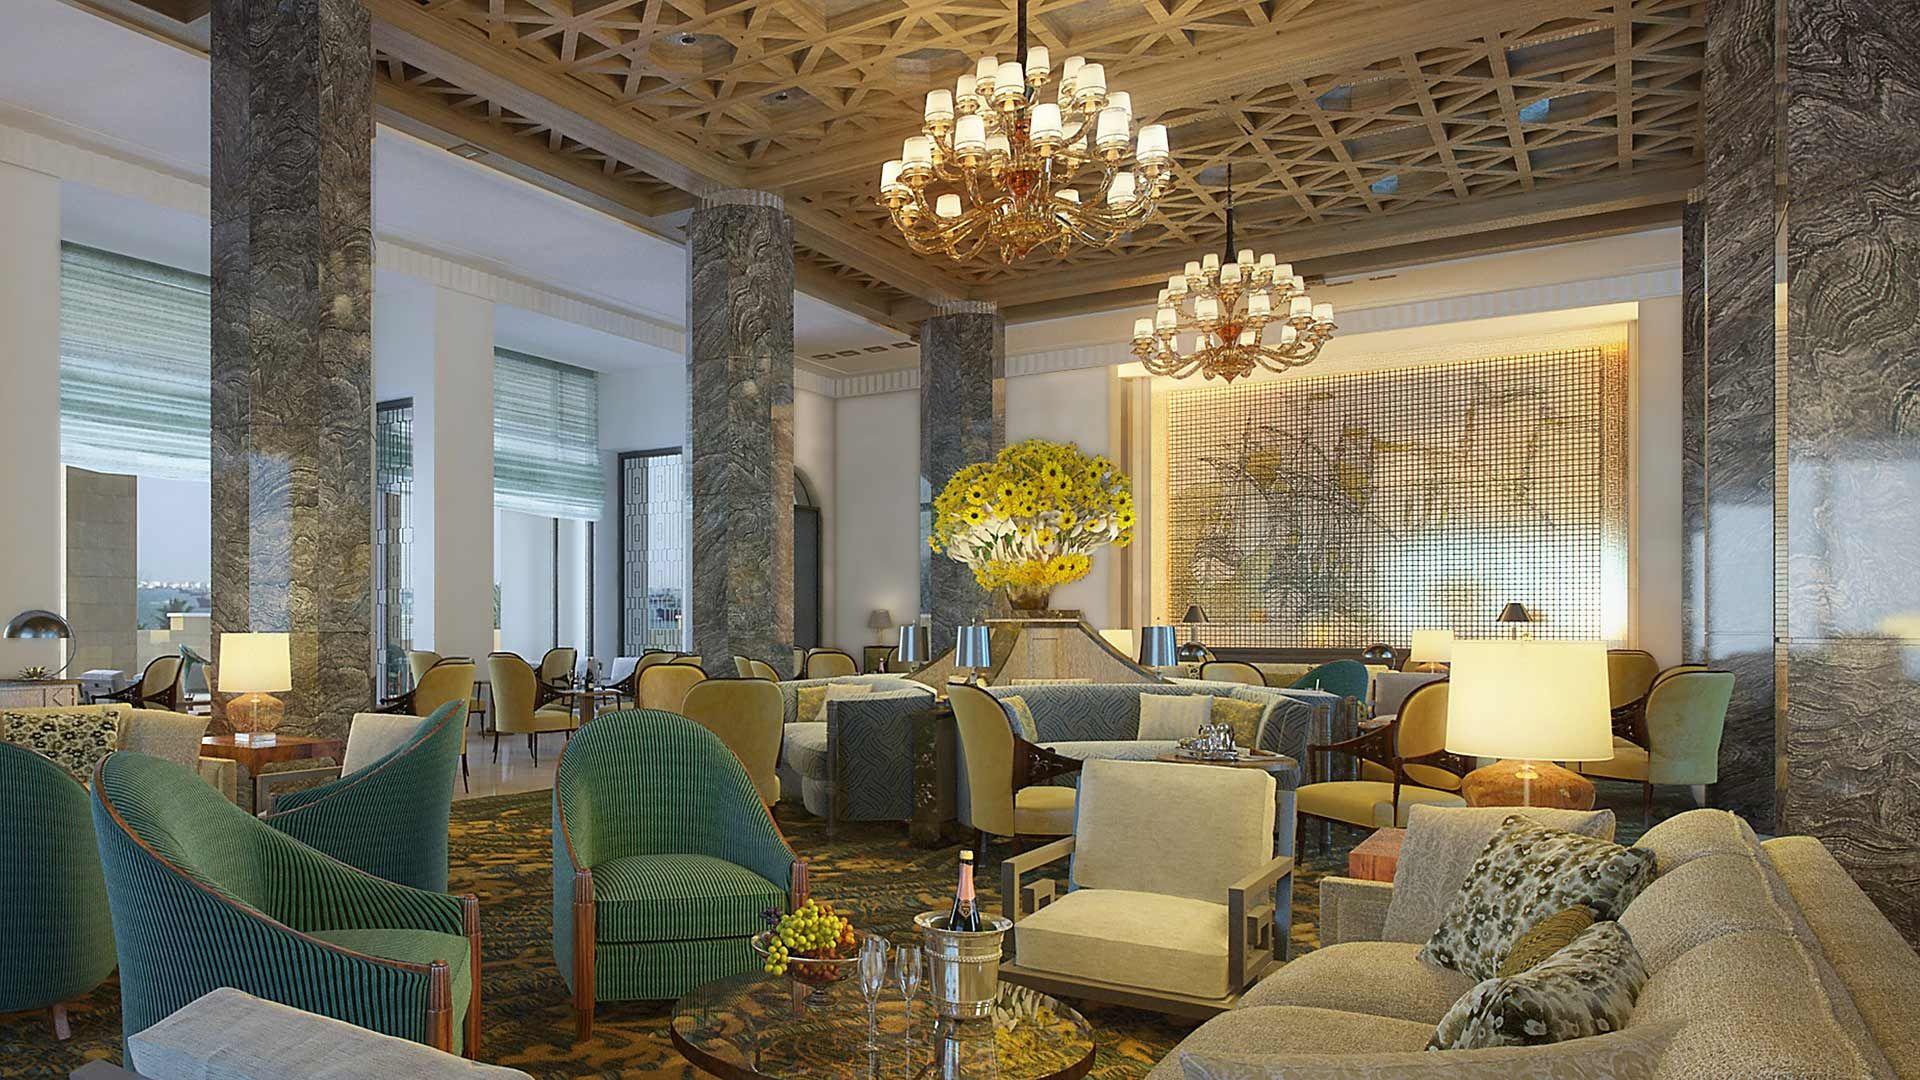 Four Seasons Hotel Dubai UAE Project Type New Hotel Architect WATG/DSA Landscape Architect EDSA Lighting Designer Craig Roberts Art Consultant James ... & Four Seasons Hotel Dubai UAE Project Type New Hotel Architect WATG ...